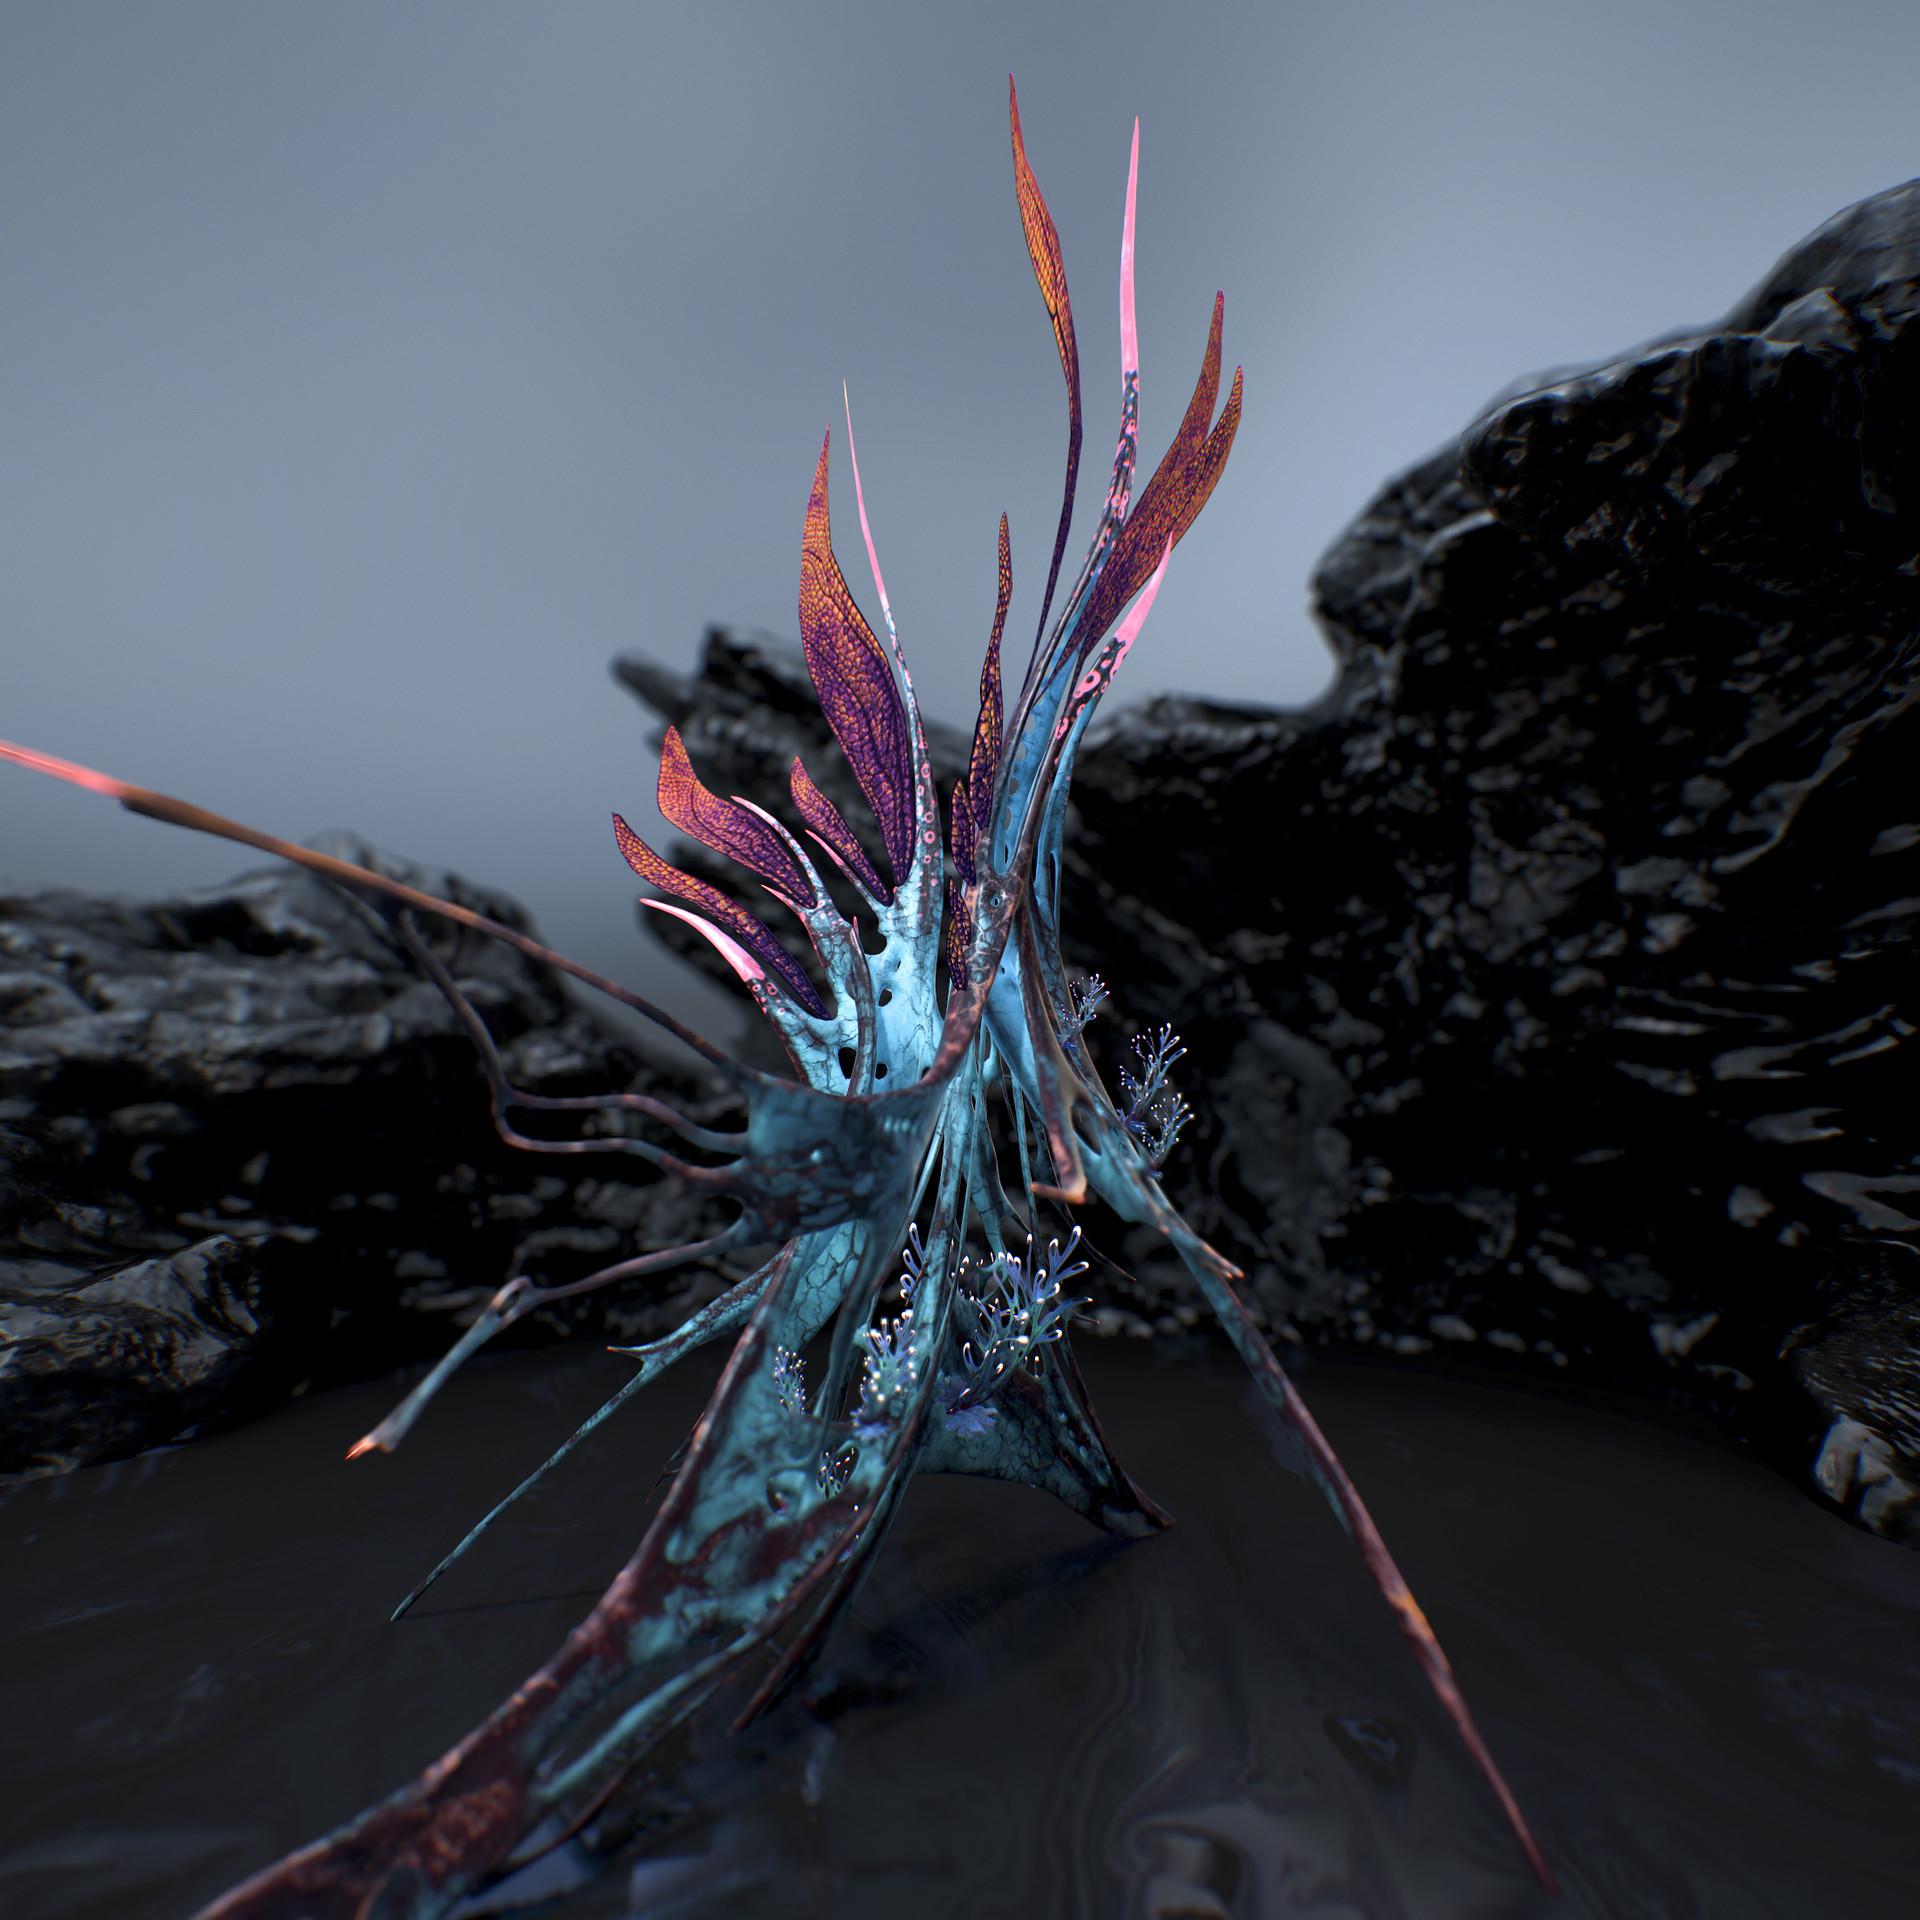 Johan de leenheer alien fern misota spletinus8